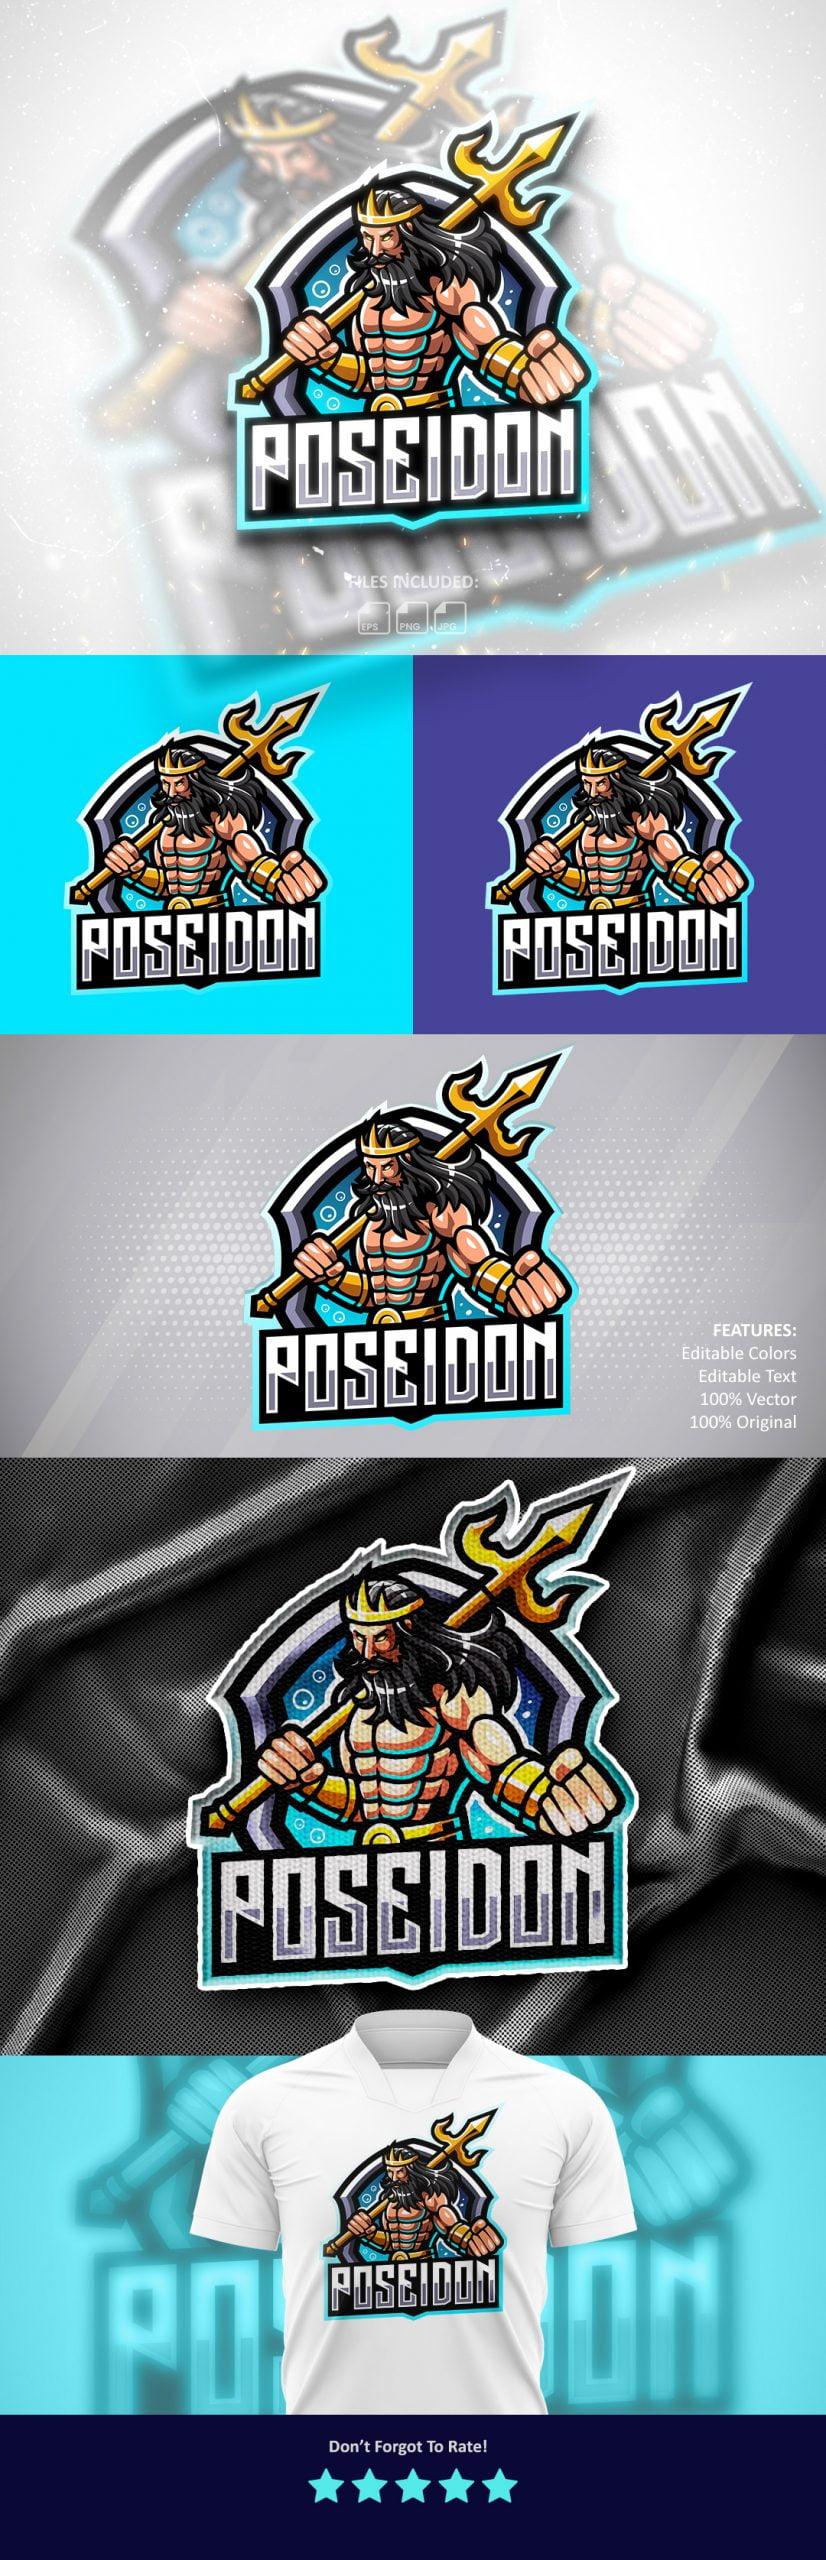 Free-Poseidon-Esports-Mascot-Logo-Download